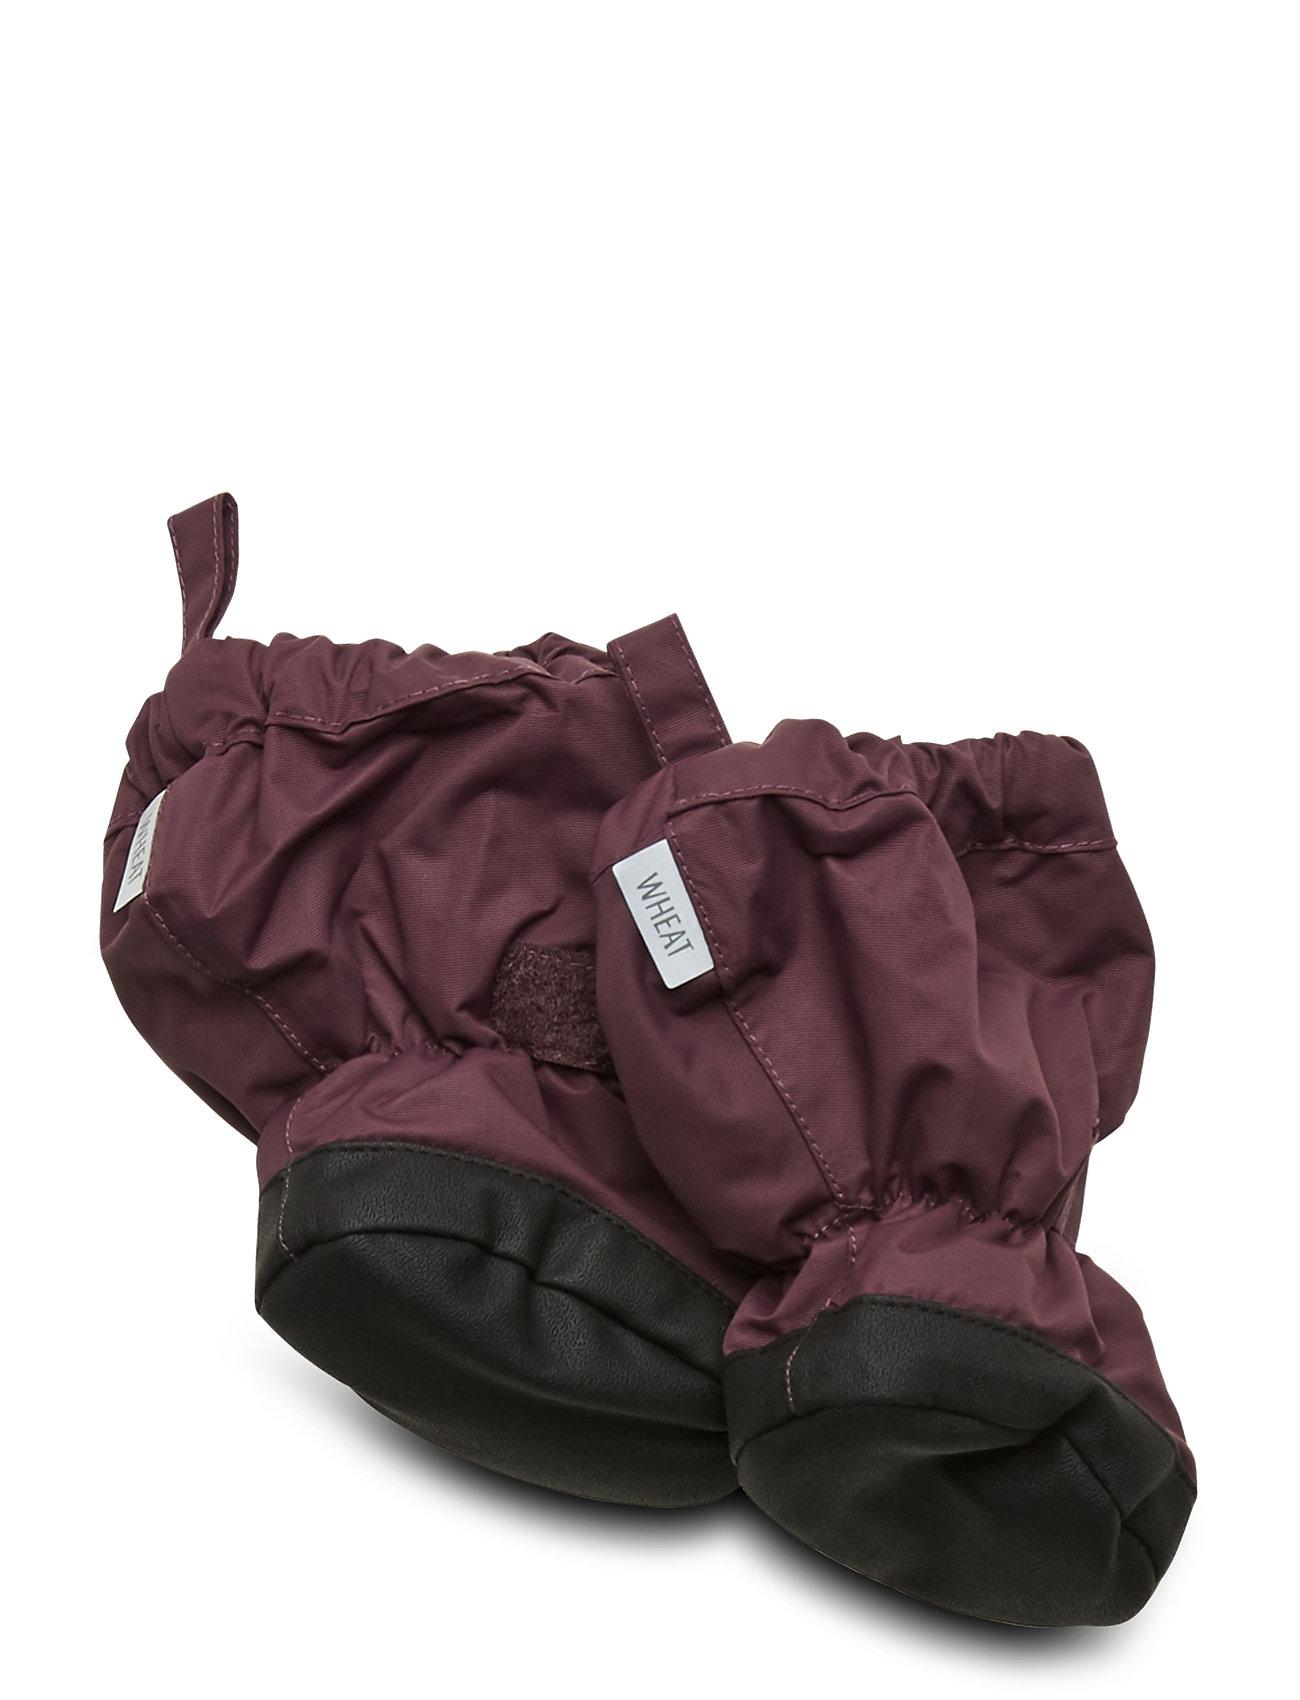 Image of Outerwear Booties Tech Outerwear Rainwear Accessories Lilla Wheat (3525334283)